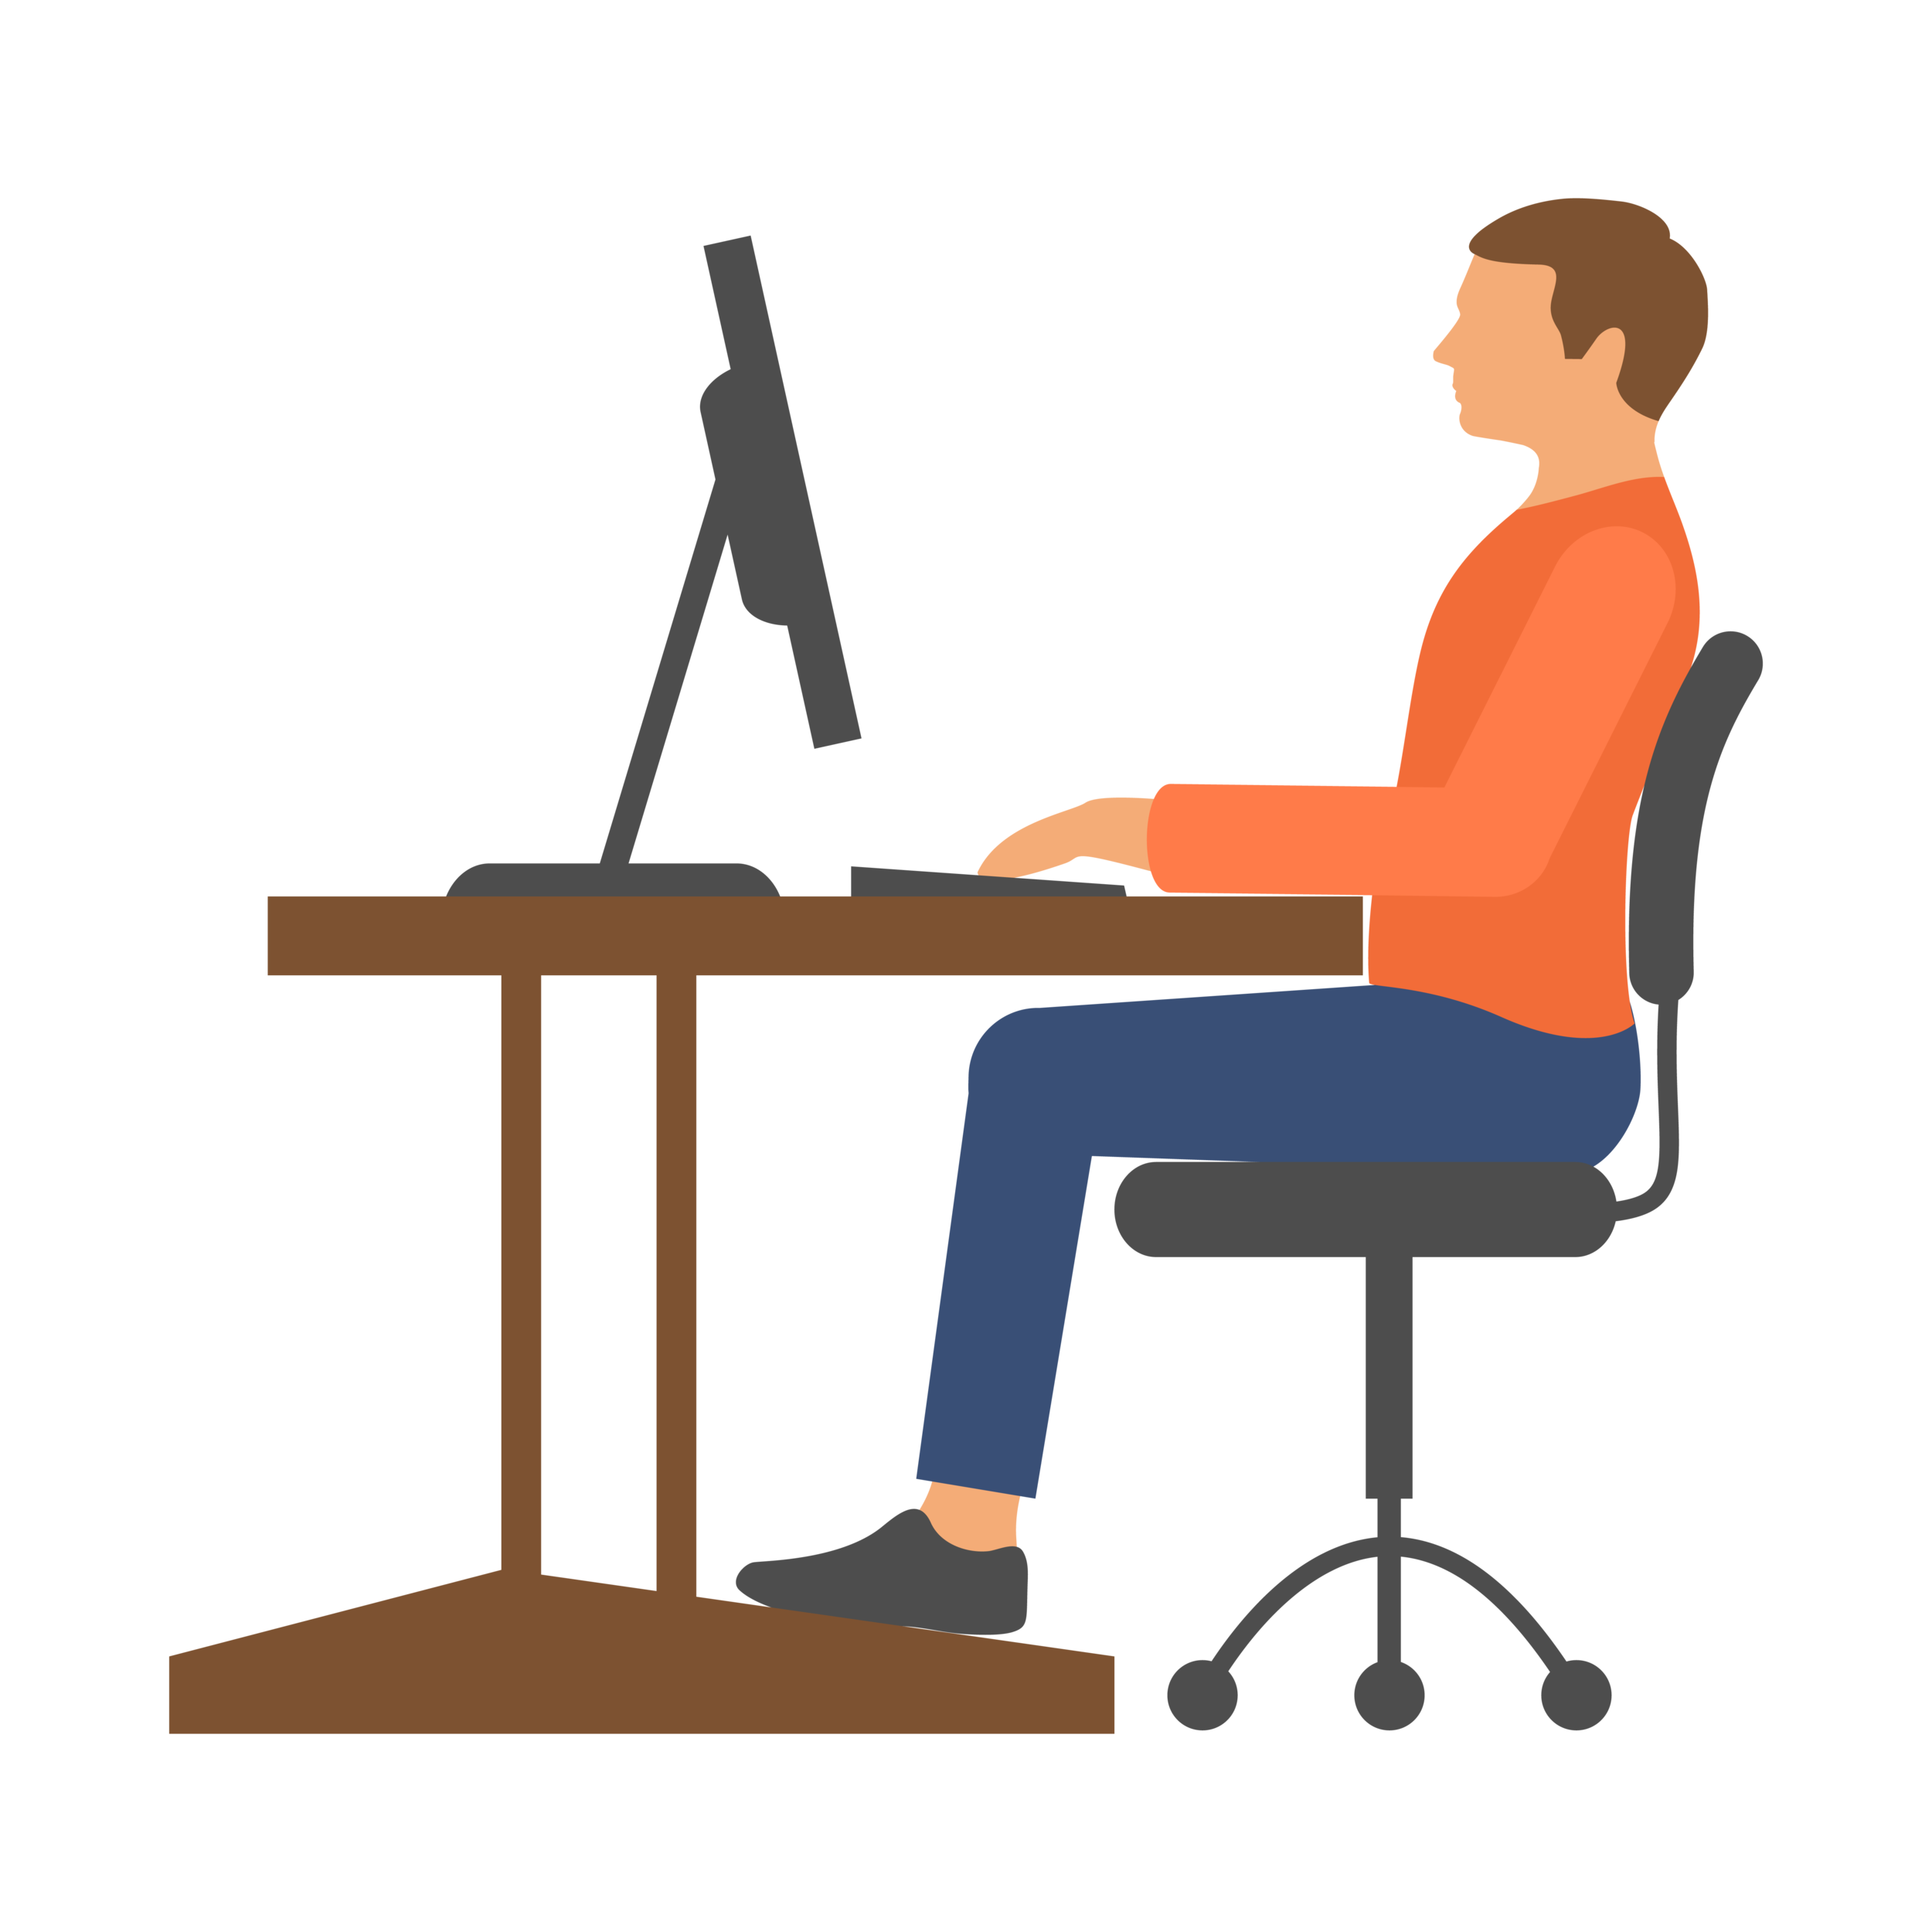 Computer-Desk-Posture-Avoid-Pain-Correct-Postue